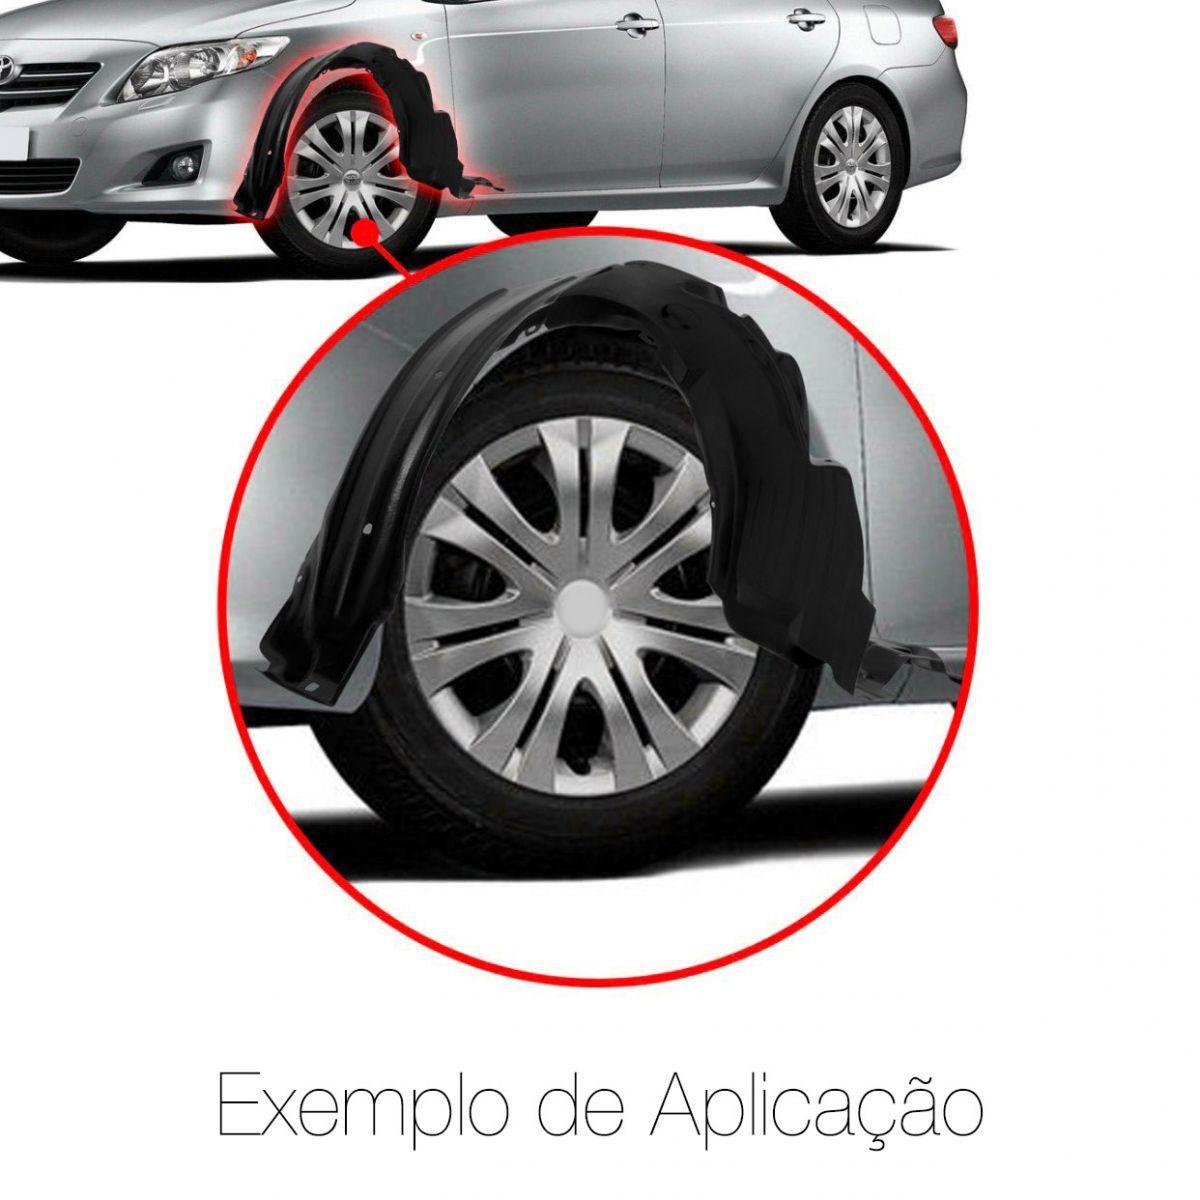 Parabarro Astra 1998 1999 2000 2001 2002 2003 2004 2005 2006 2007 2008 2009 2010 2011